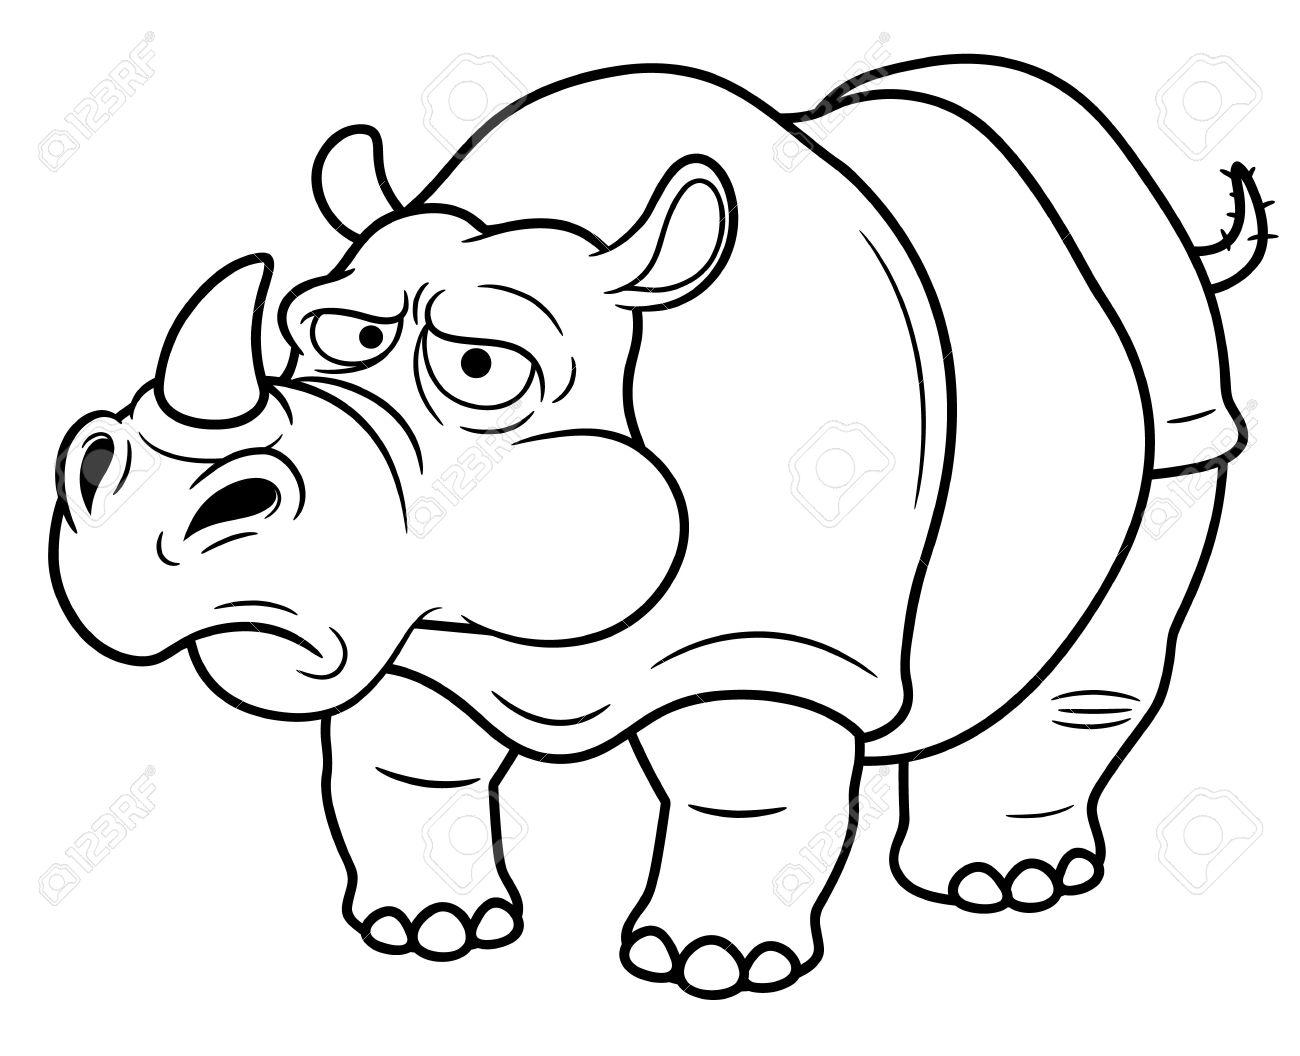 Rhino Outline Drawing At Getdrawings